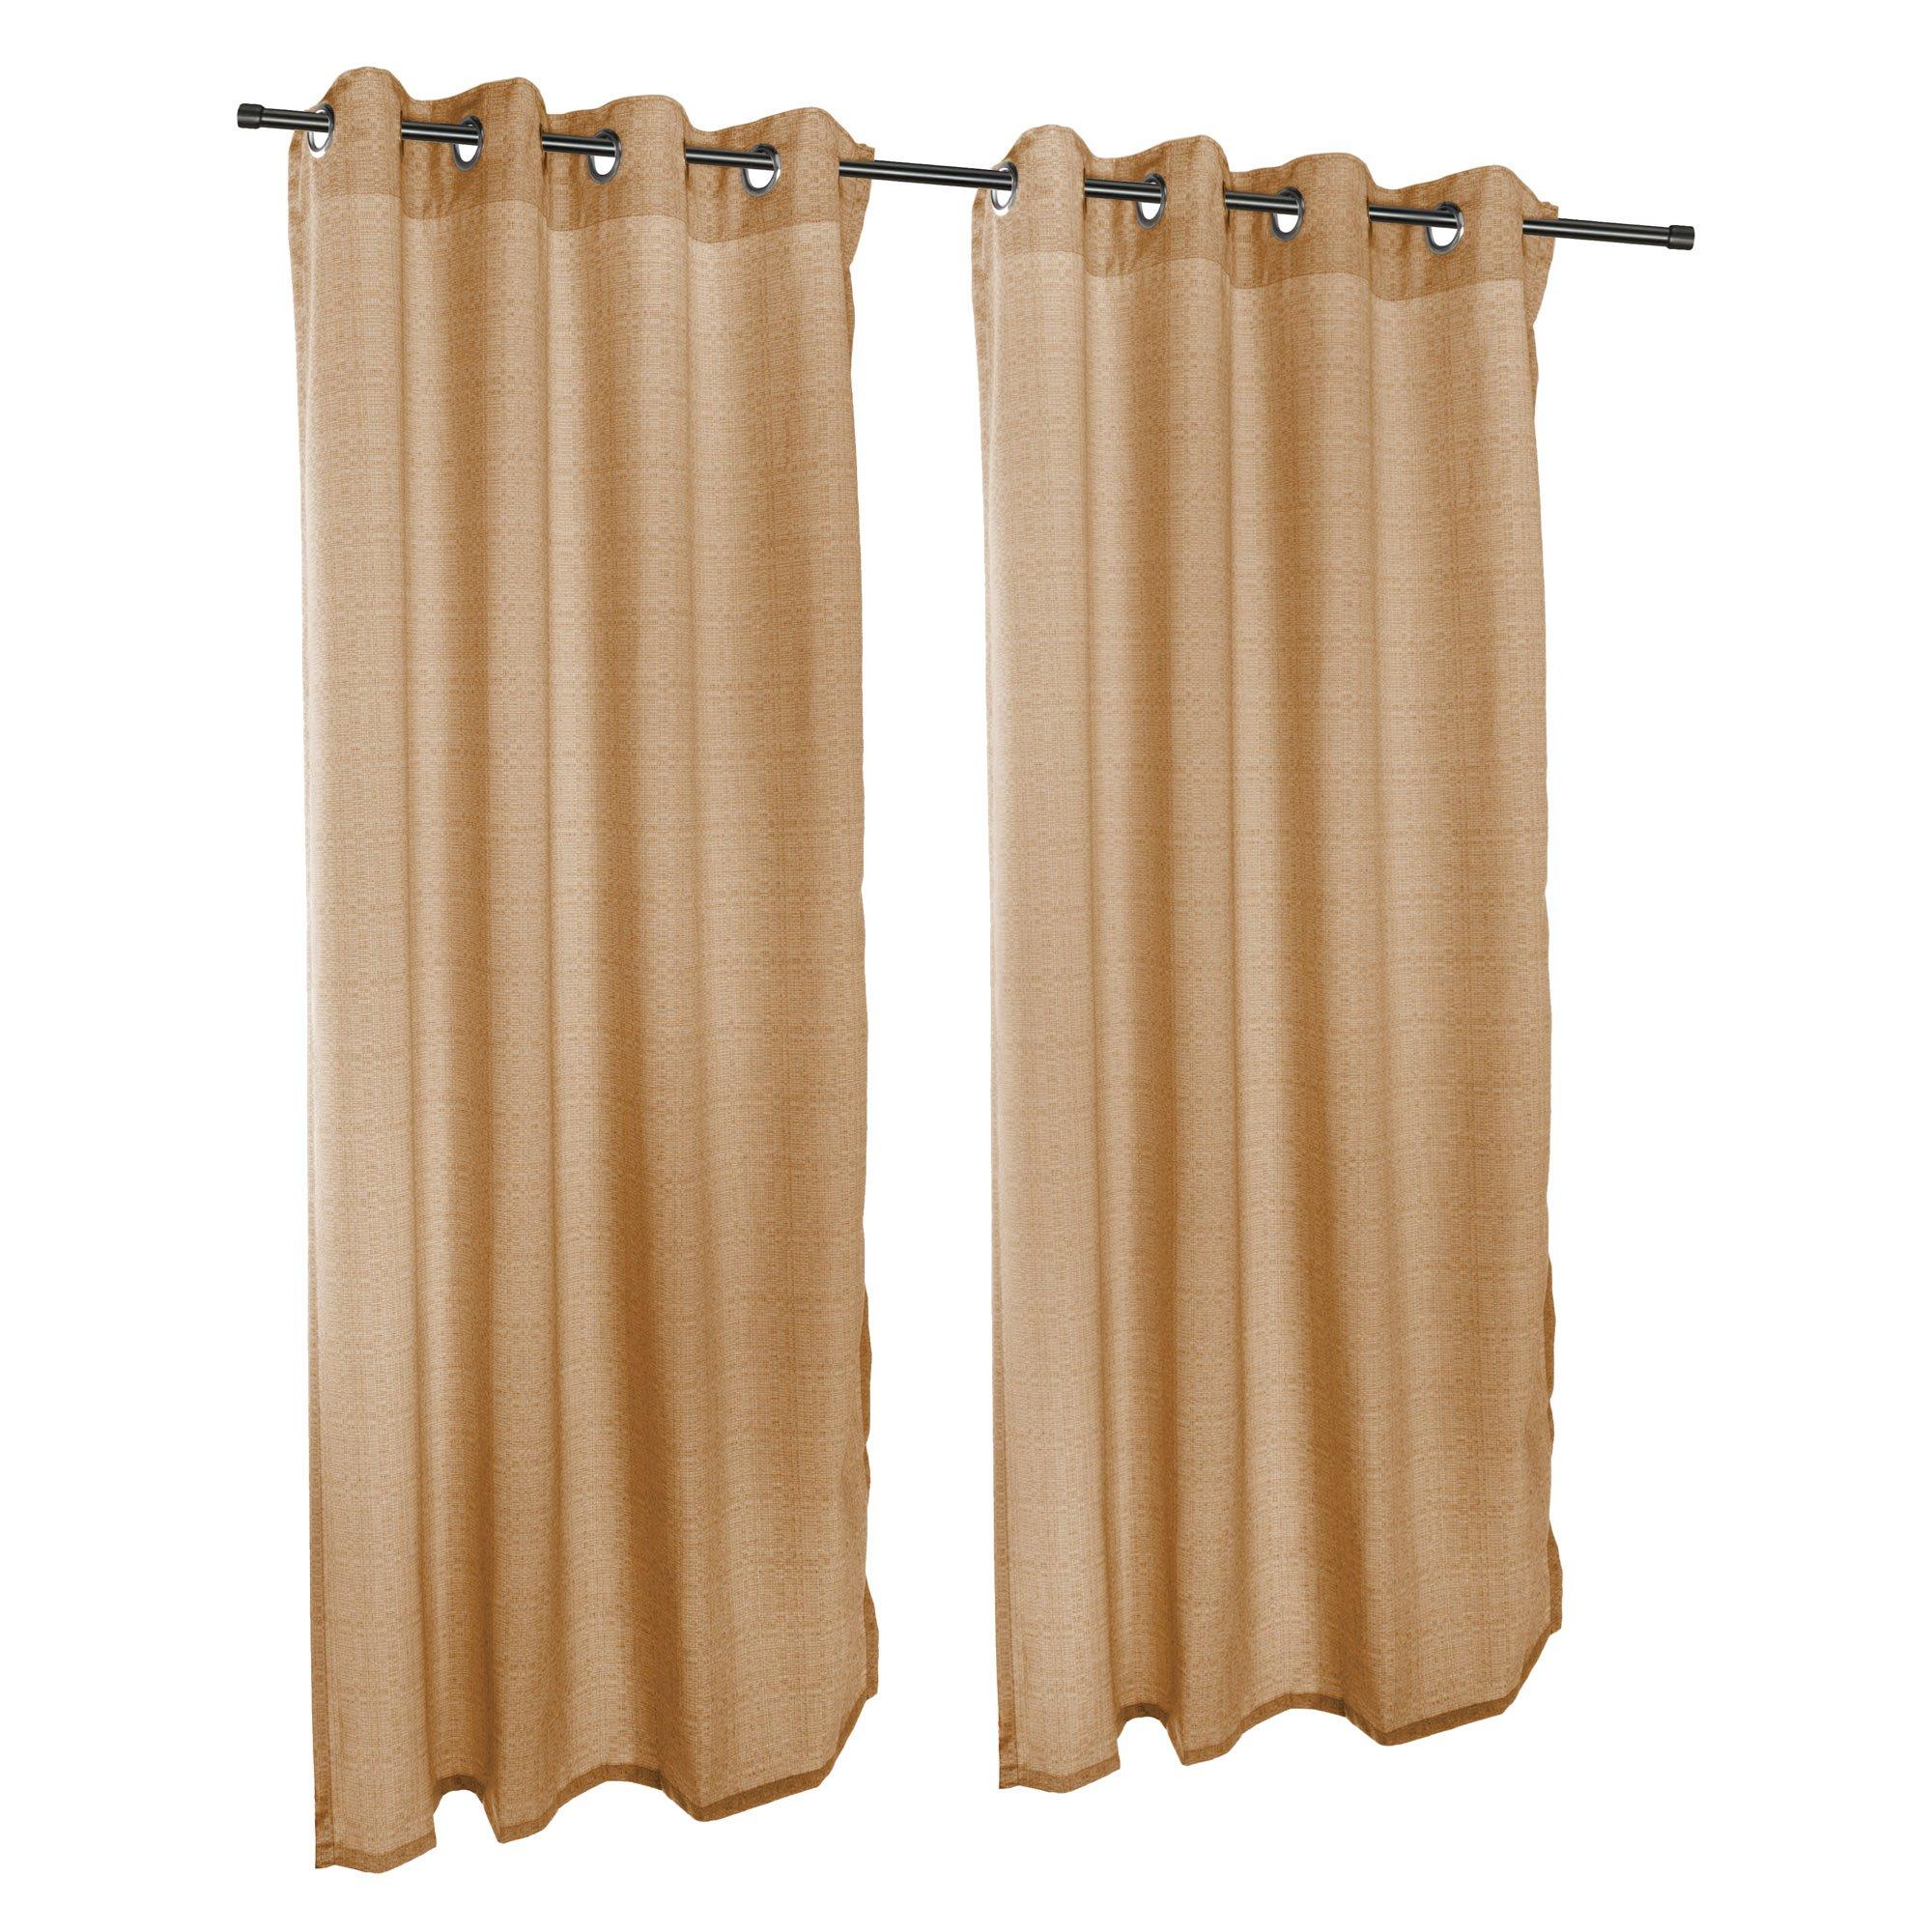 Sunbrella Outdoor Linen Curtain with Grommets